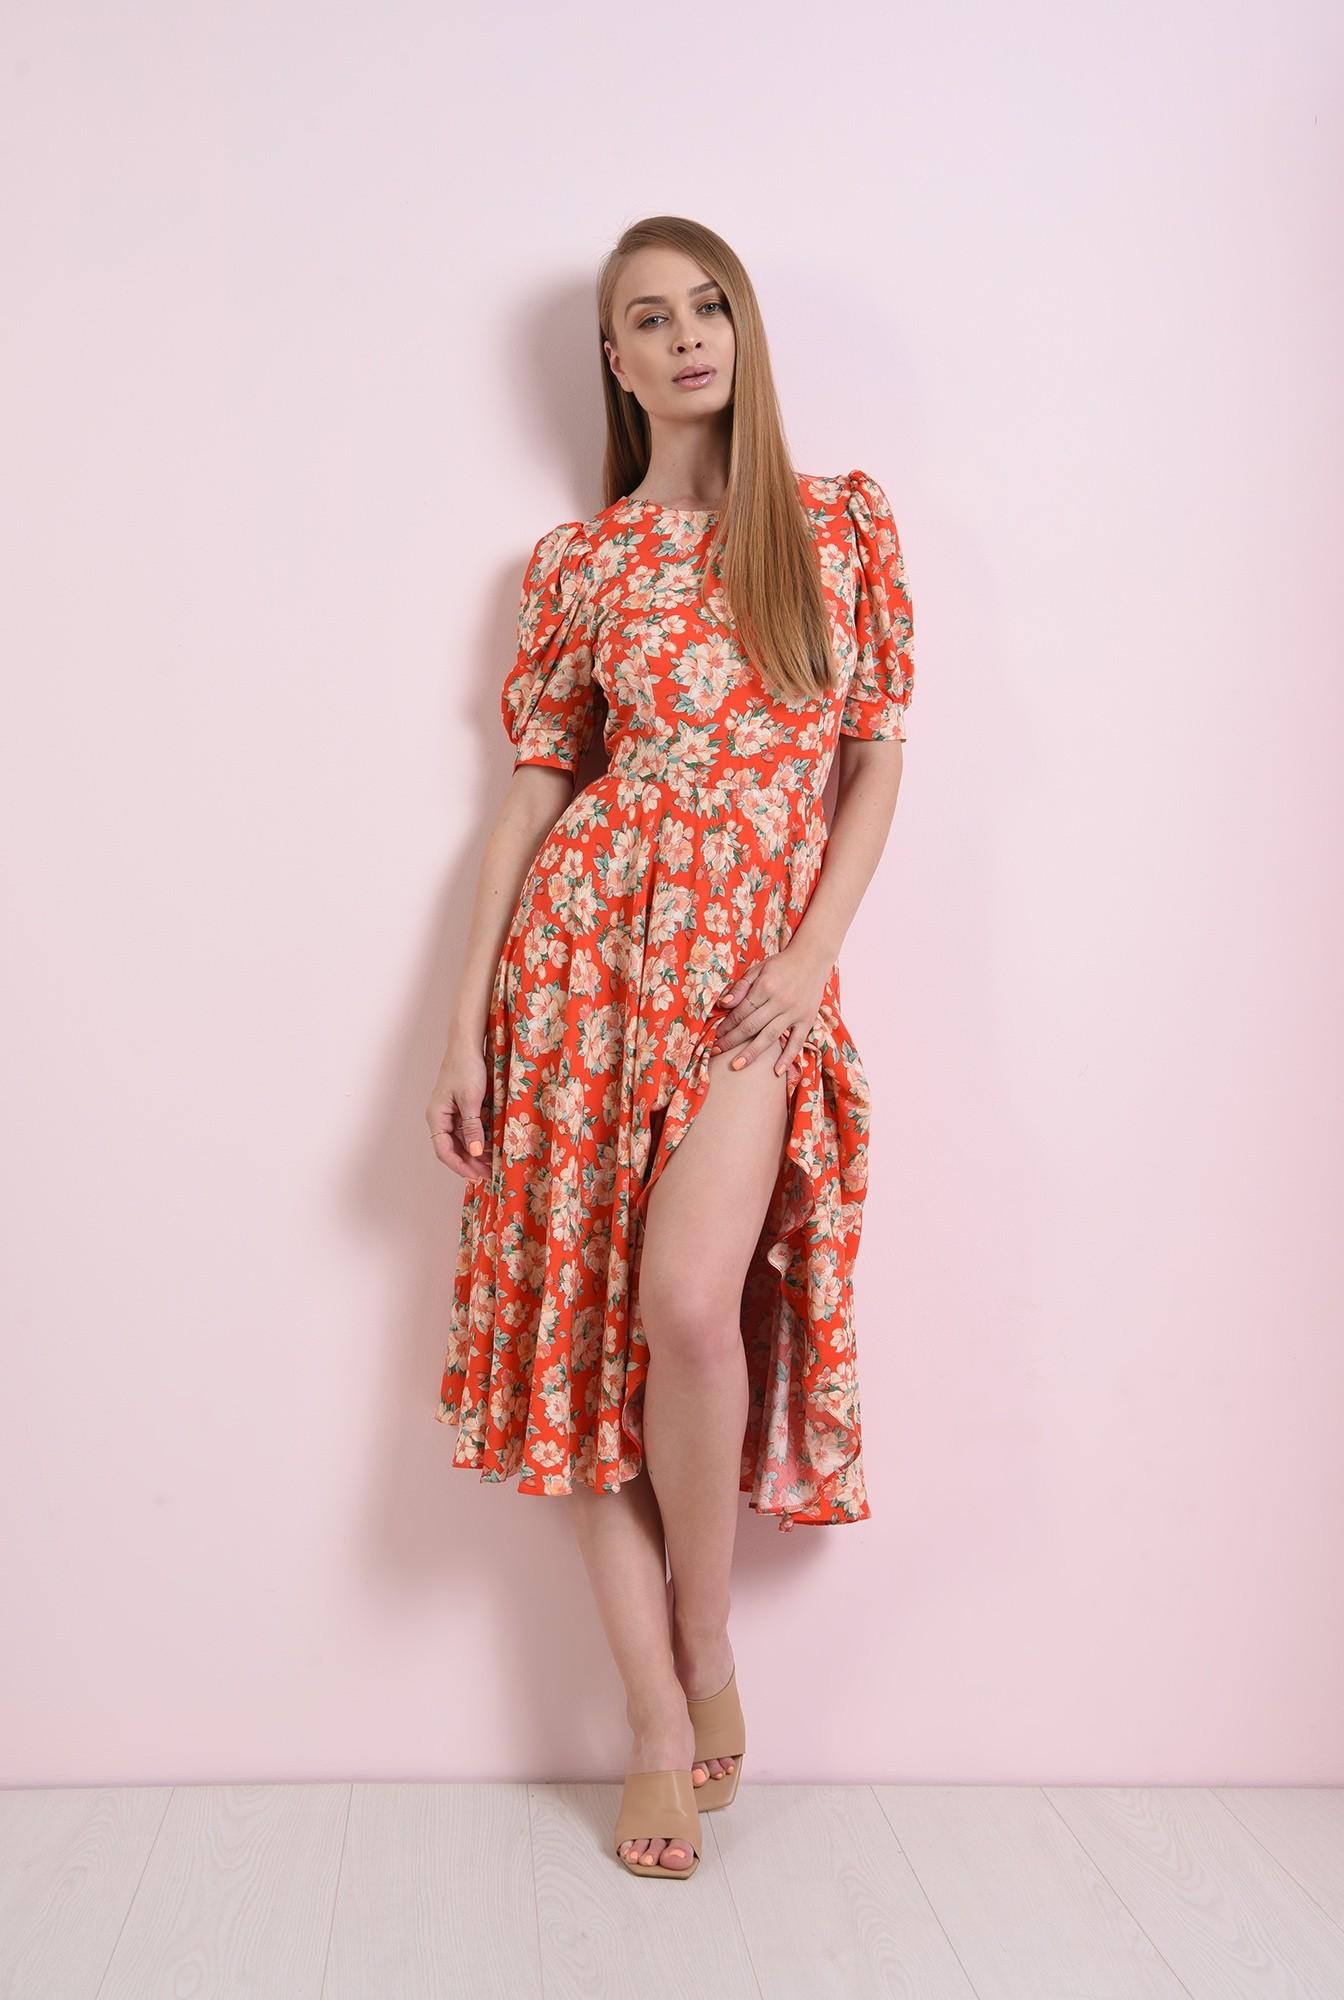 0 - rochie rosie, cu flori, evazata, Poema